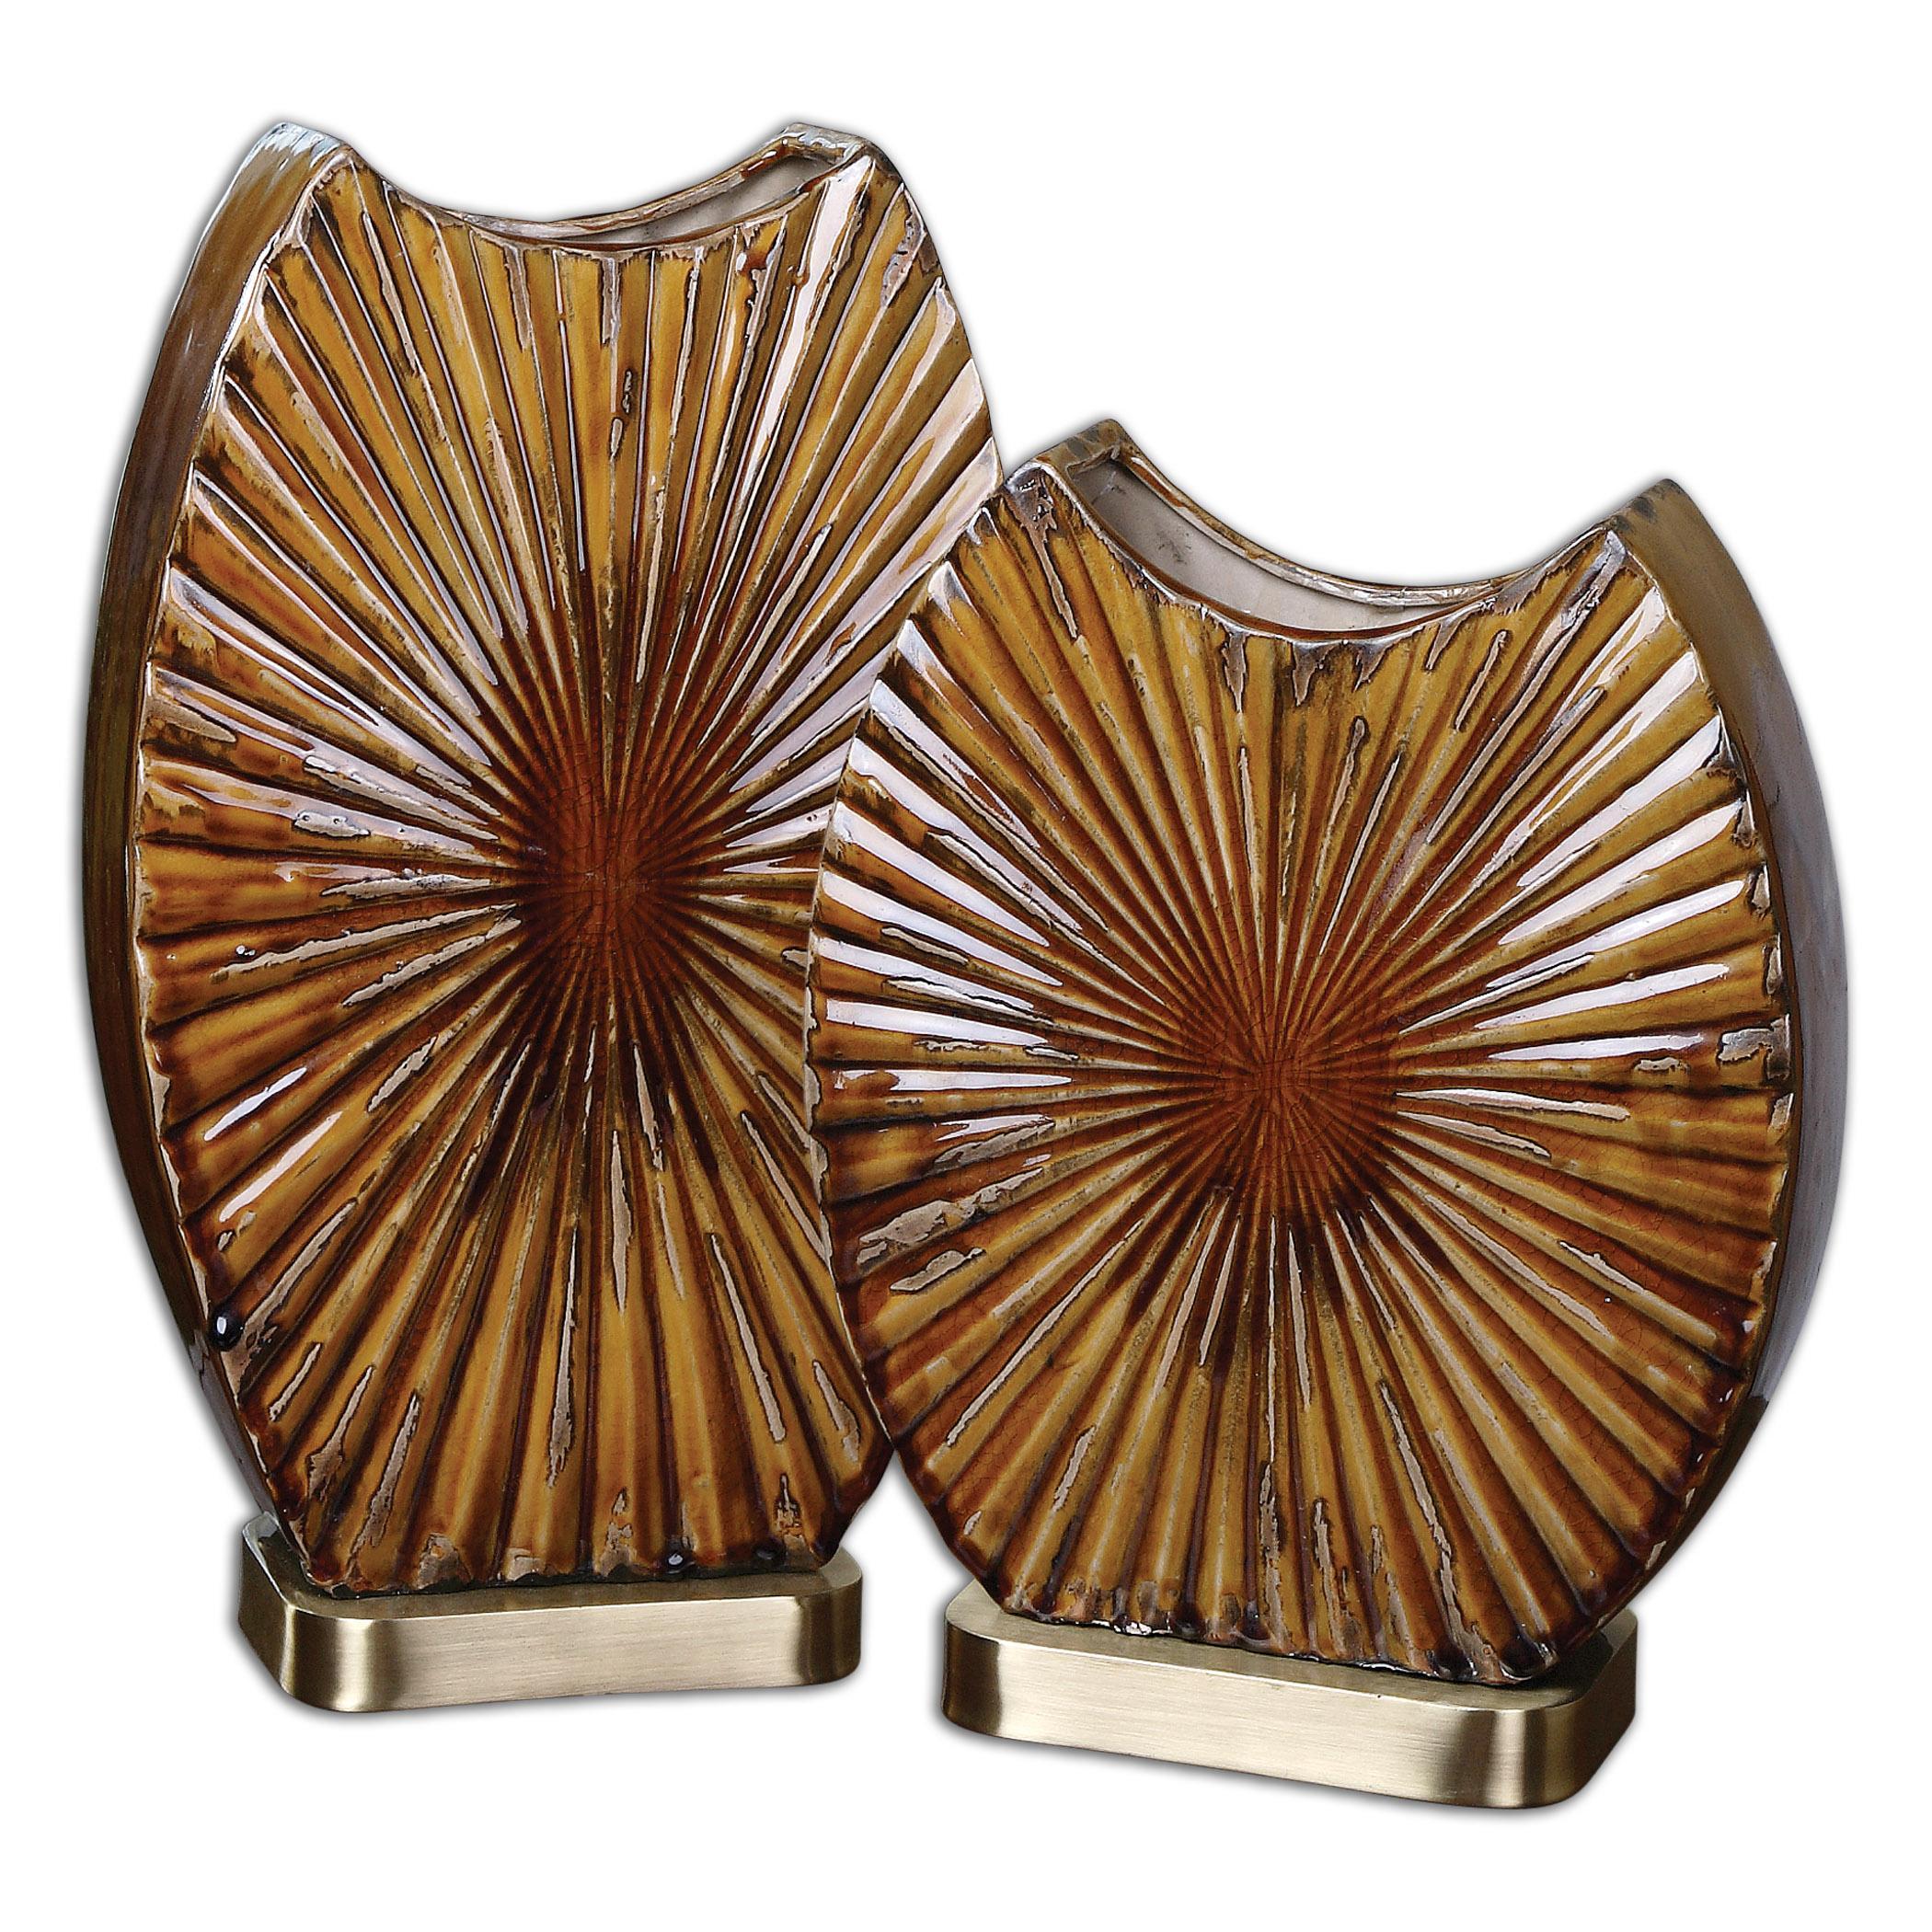 Uttermost Accessories Zarina Marbled Ceramic Vases Set of 2 - Item Number: 19867